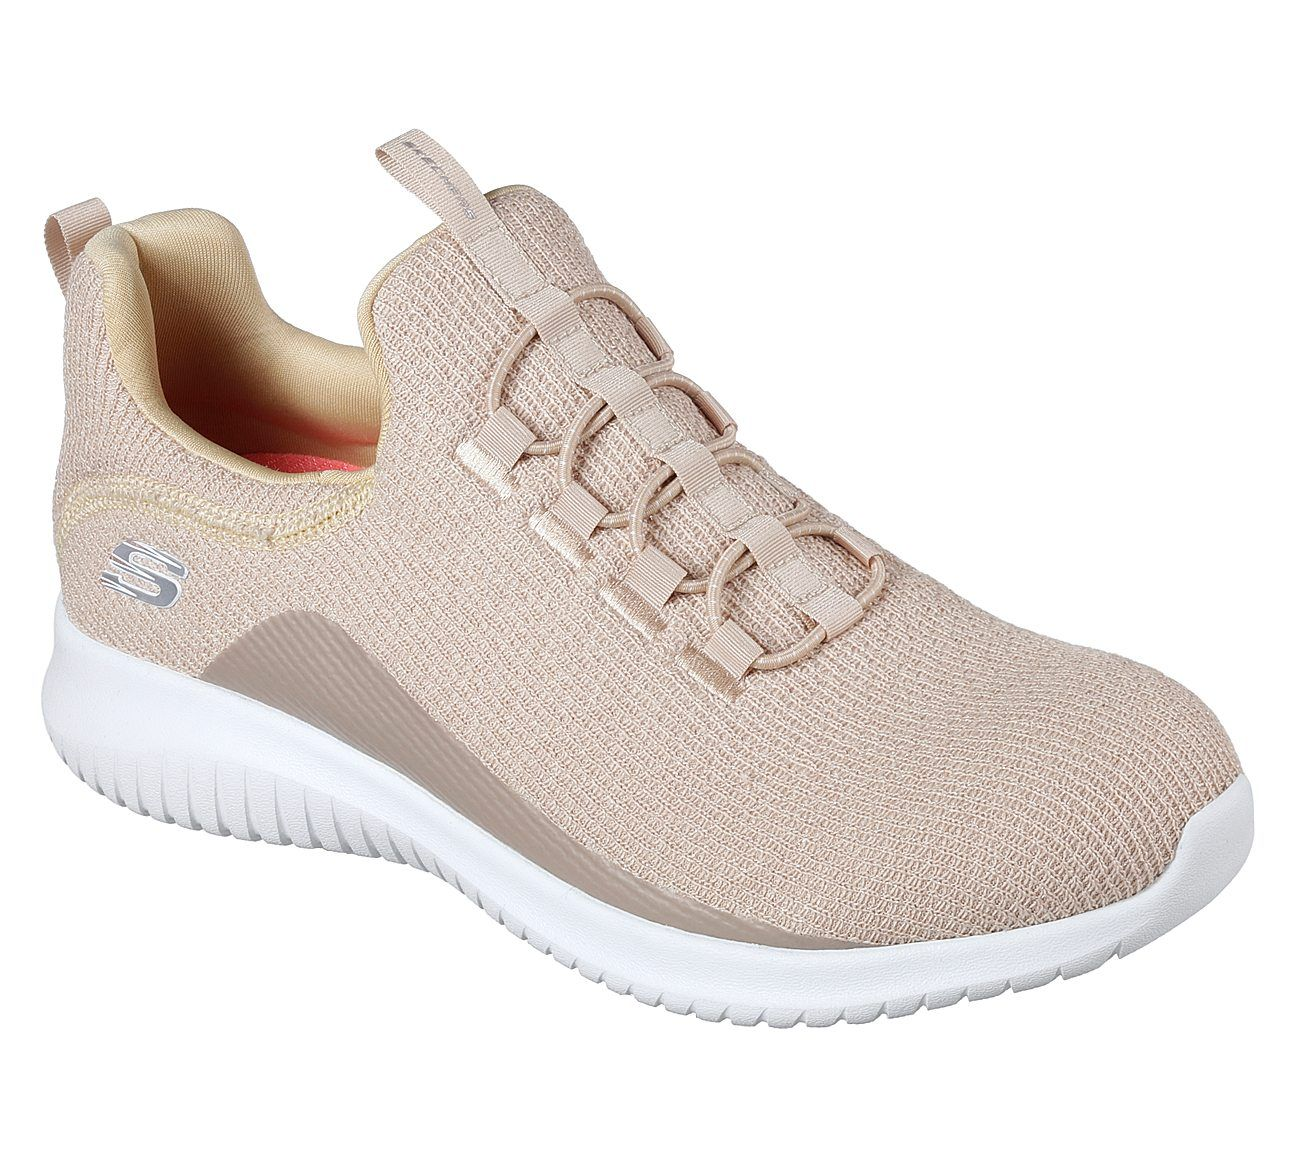 best sneakers 1a79f e947e Burst - City Scene in 2019   123   City scene, Fabric shoes, Skechers